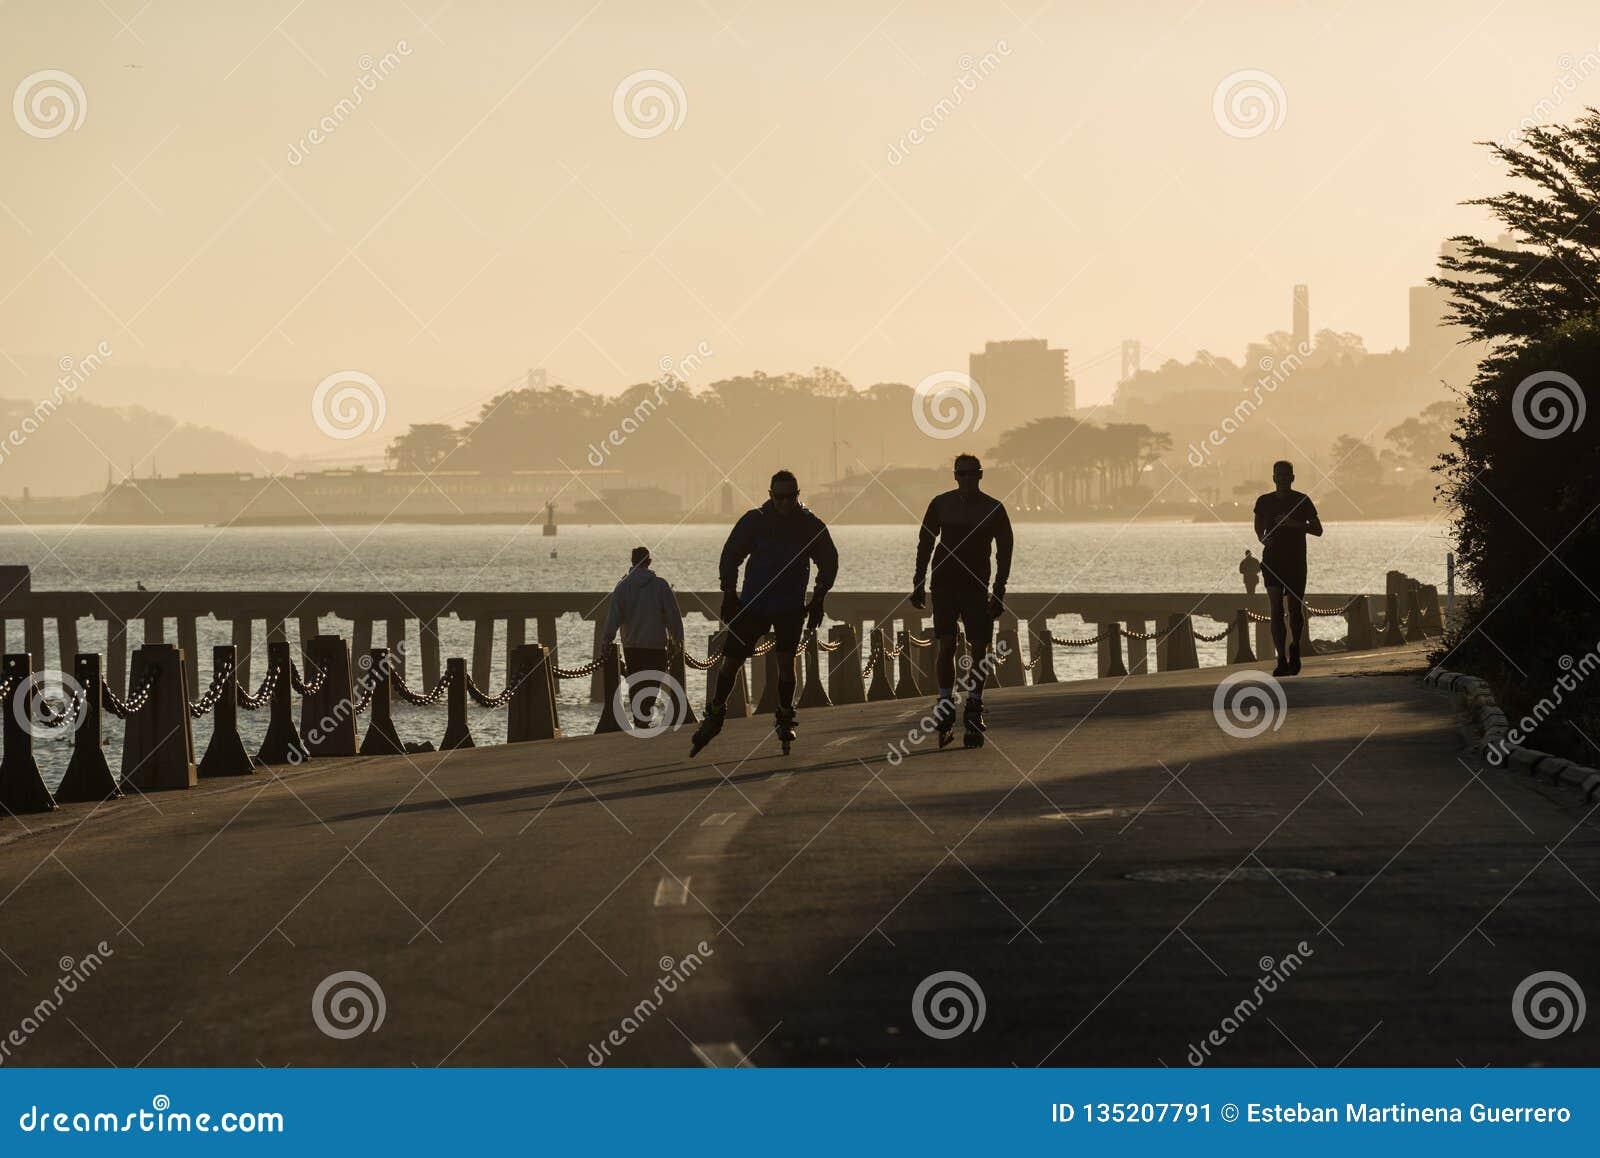 SAN FRANCISCO, USA - OCTOBER 12, 2018: People skating and running near Torpedo Wharf and Fort Point San Francisco